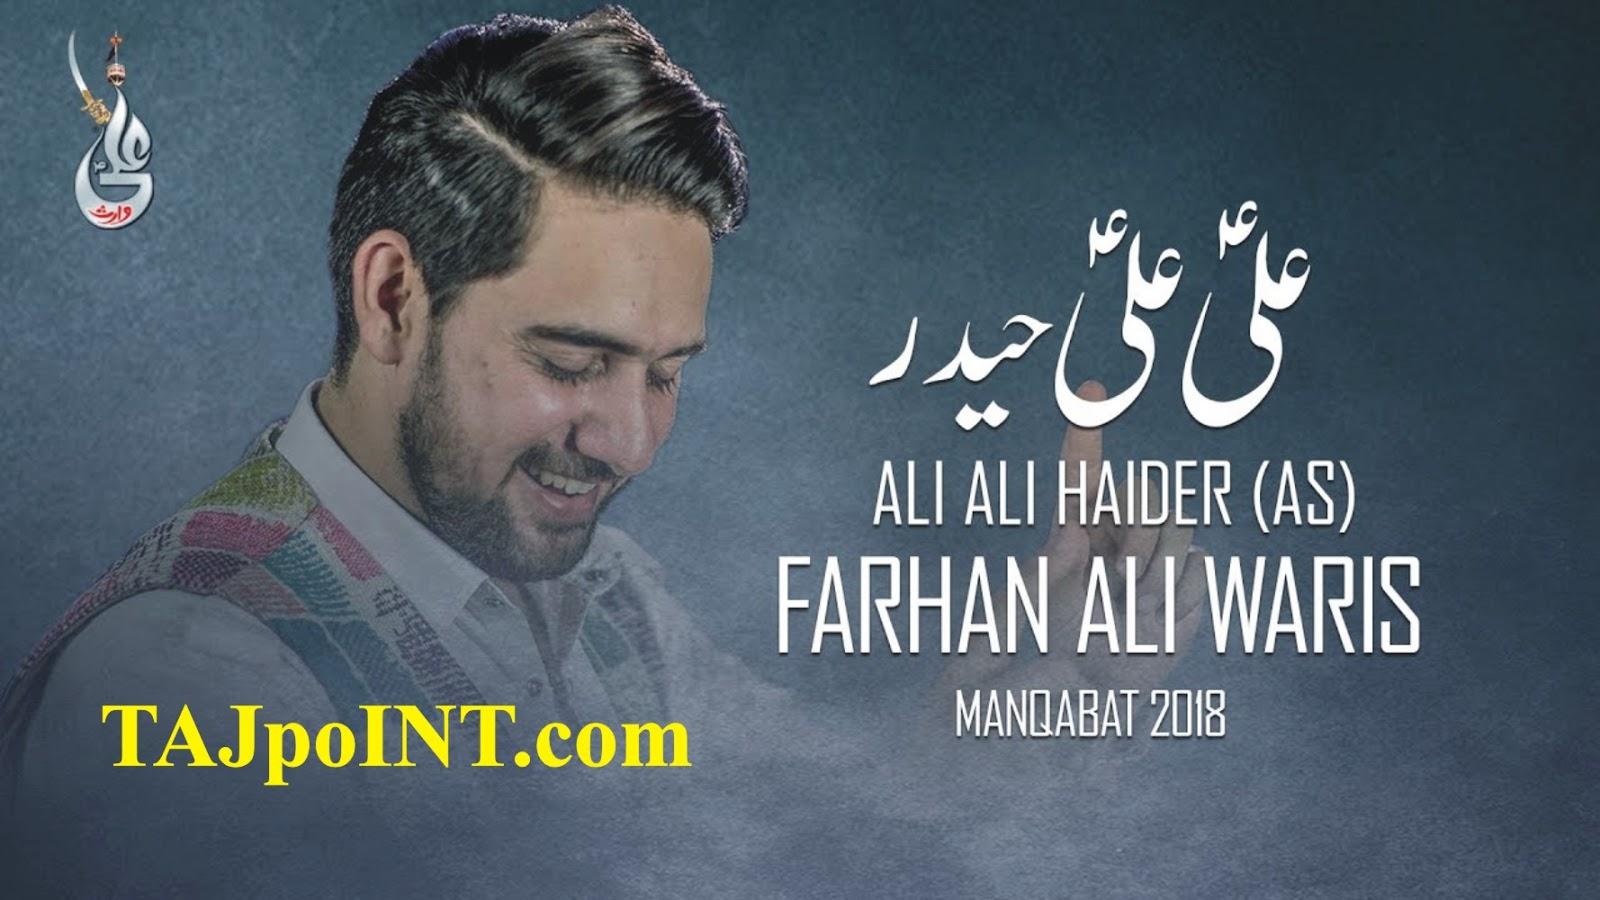 Farhan Ali Waris 2018-19 manqabat free mp3 download